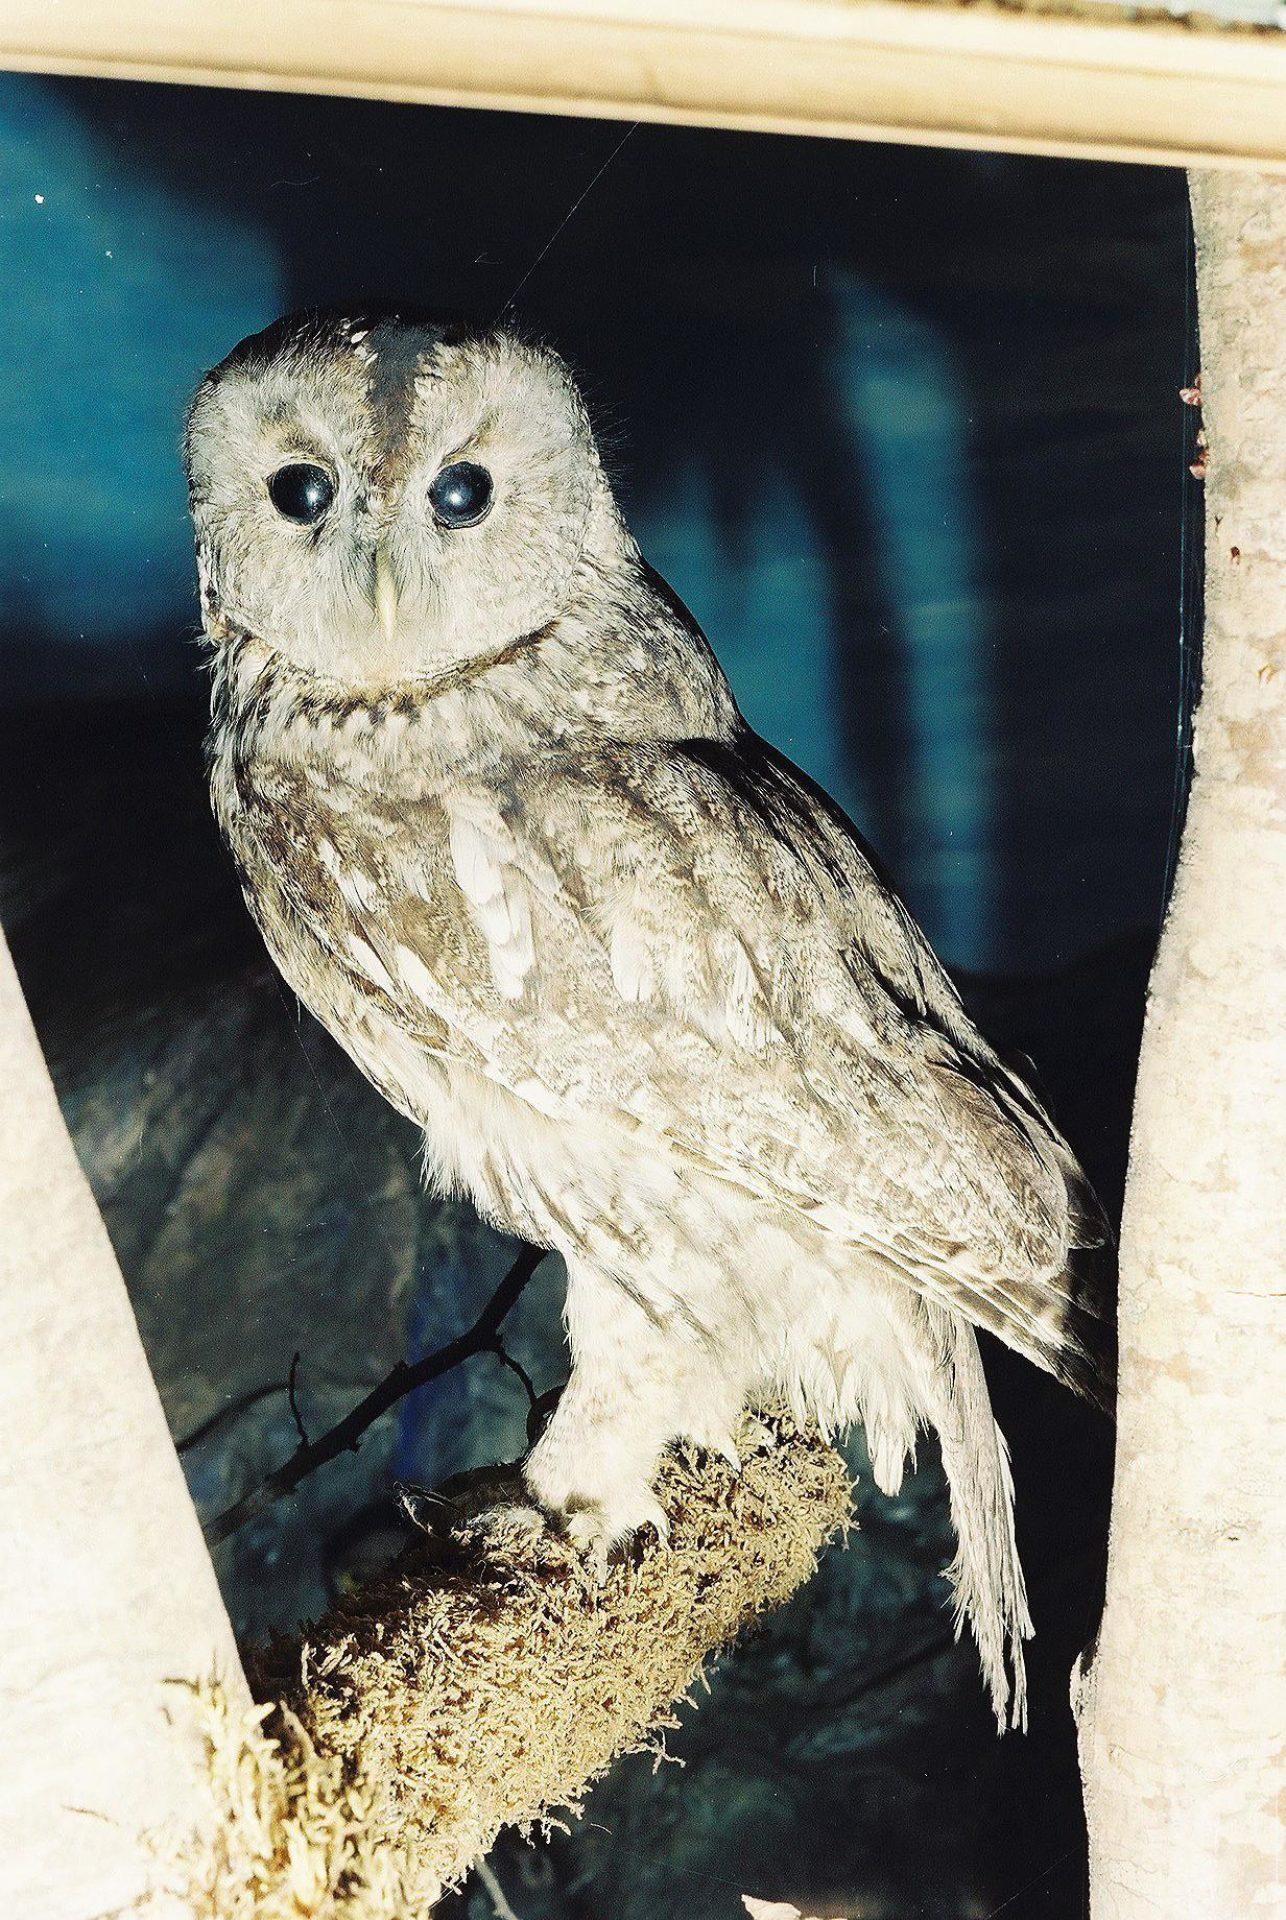 Petrit Halilaj, Special Edition (ex-Natural History Museum of Kosovo), 2013 (12/80)